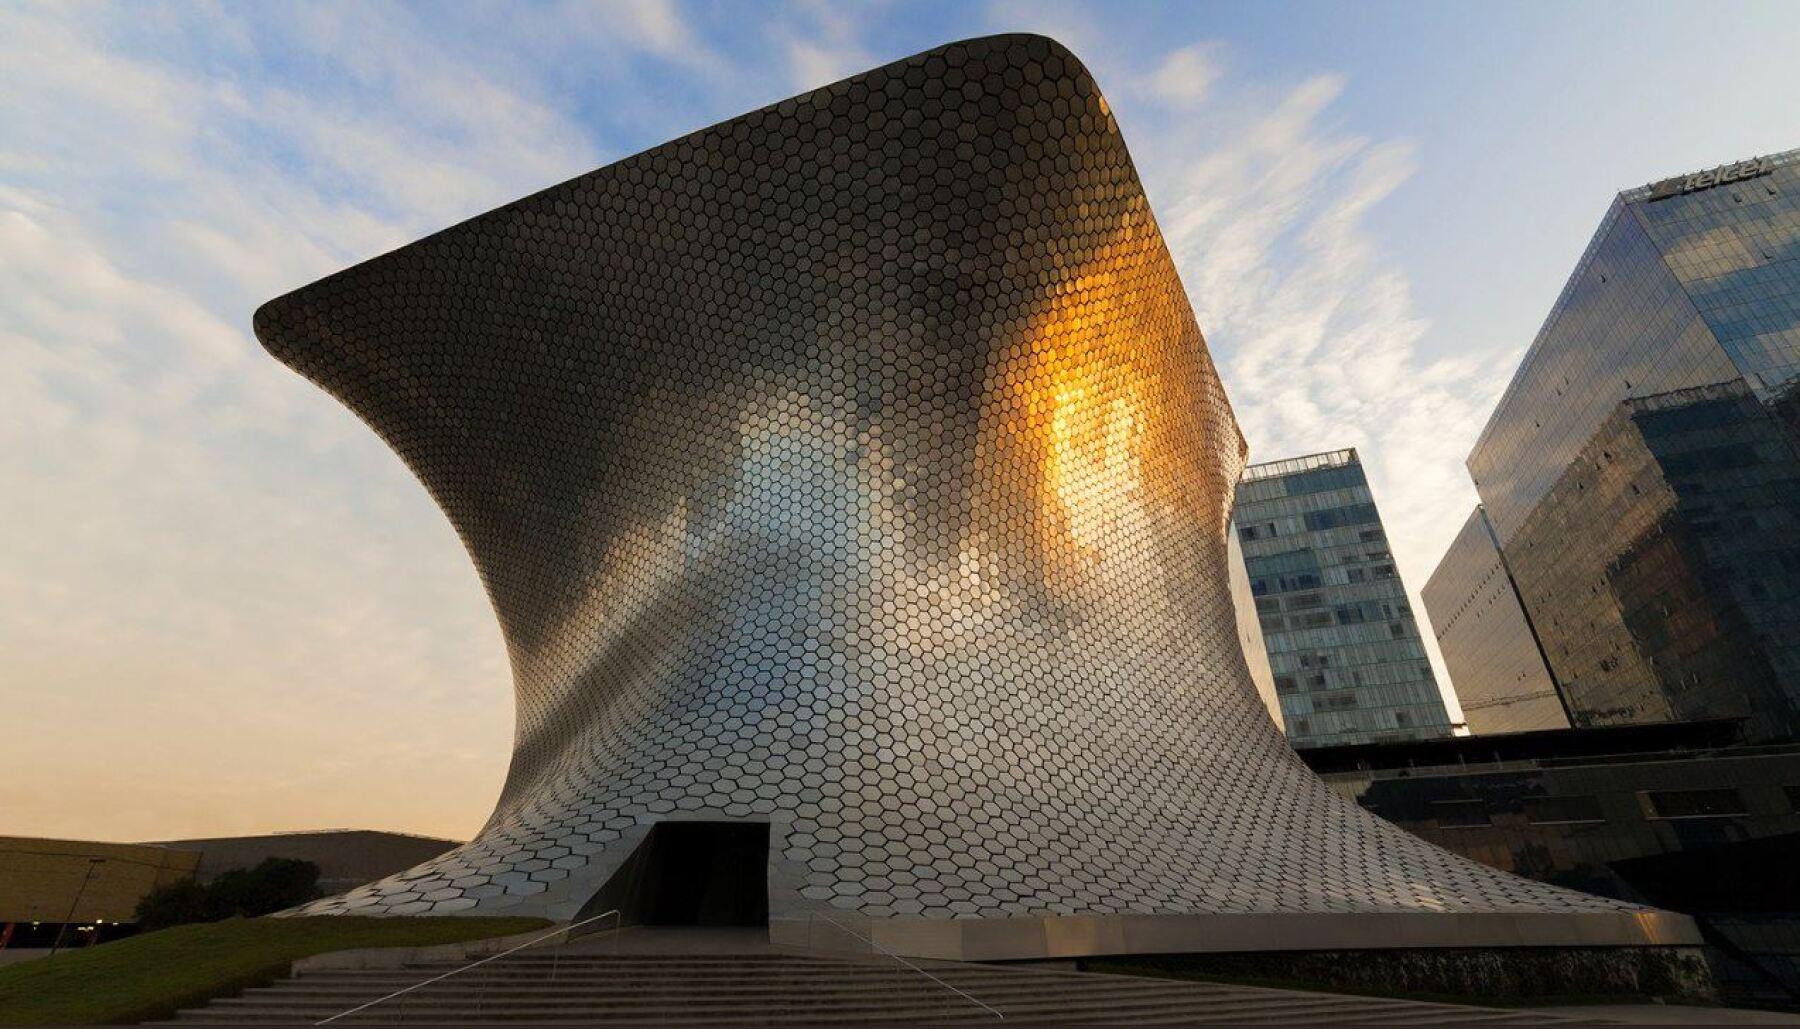 47 millones de euros costo esta impresionante obra de la arquitectura moderna.